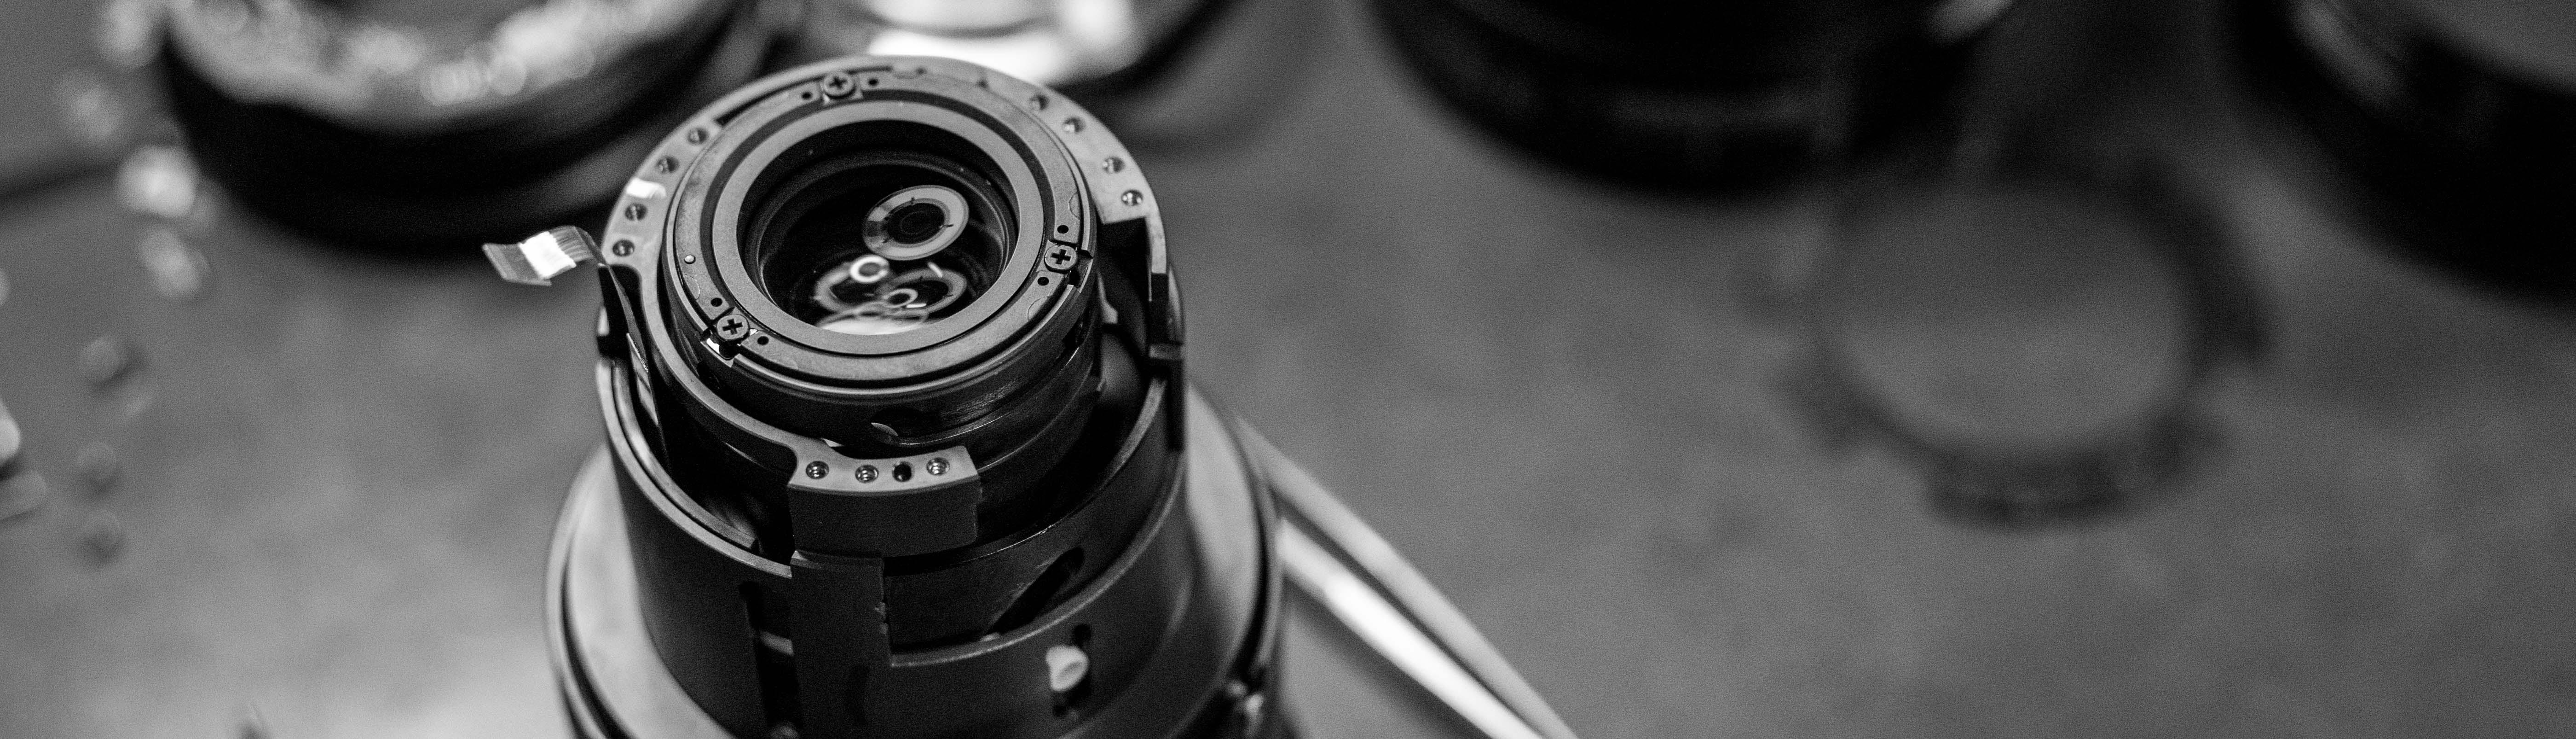 Sydney Camera Repais - Lens Repair